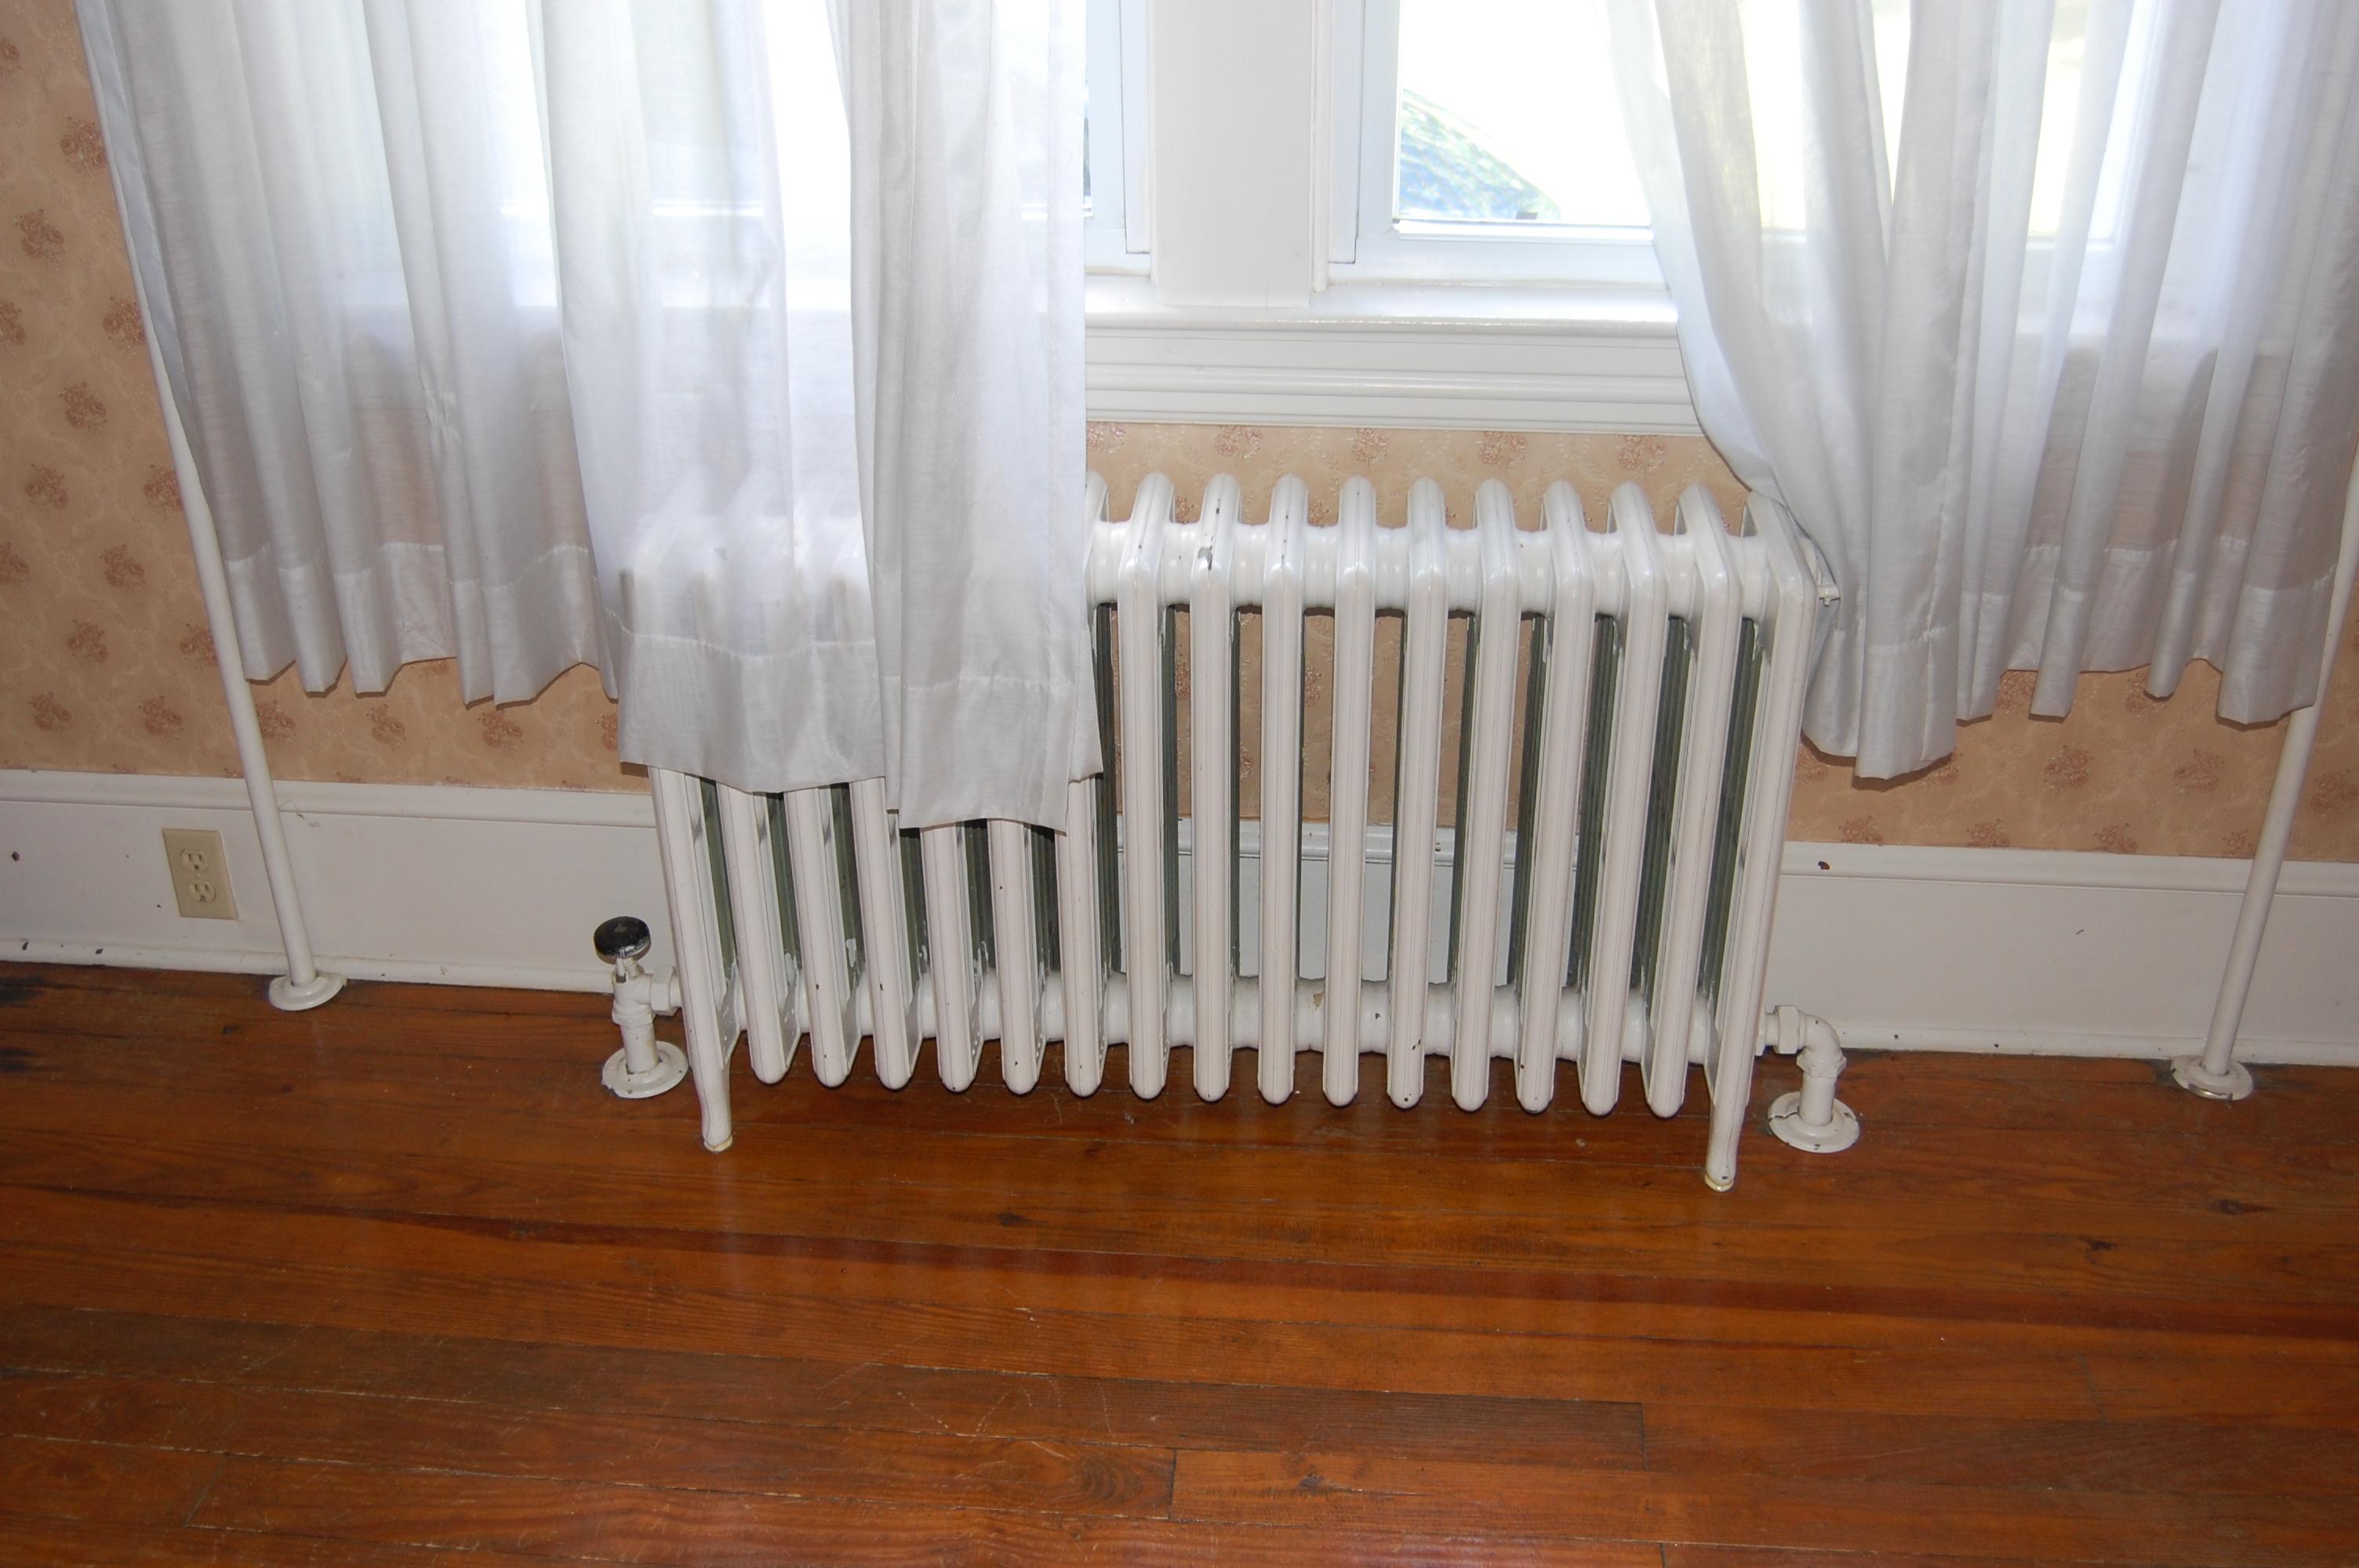 Brilliant Designer Radiators Jaga Home Heating Vertical Radiators For Largest Home Design Picture Inspirations Pitcheantrous